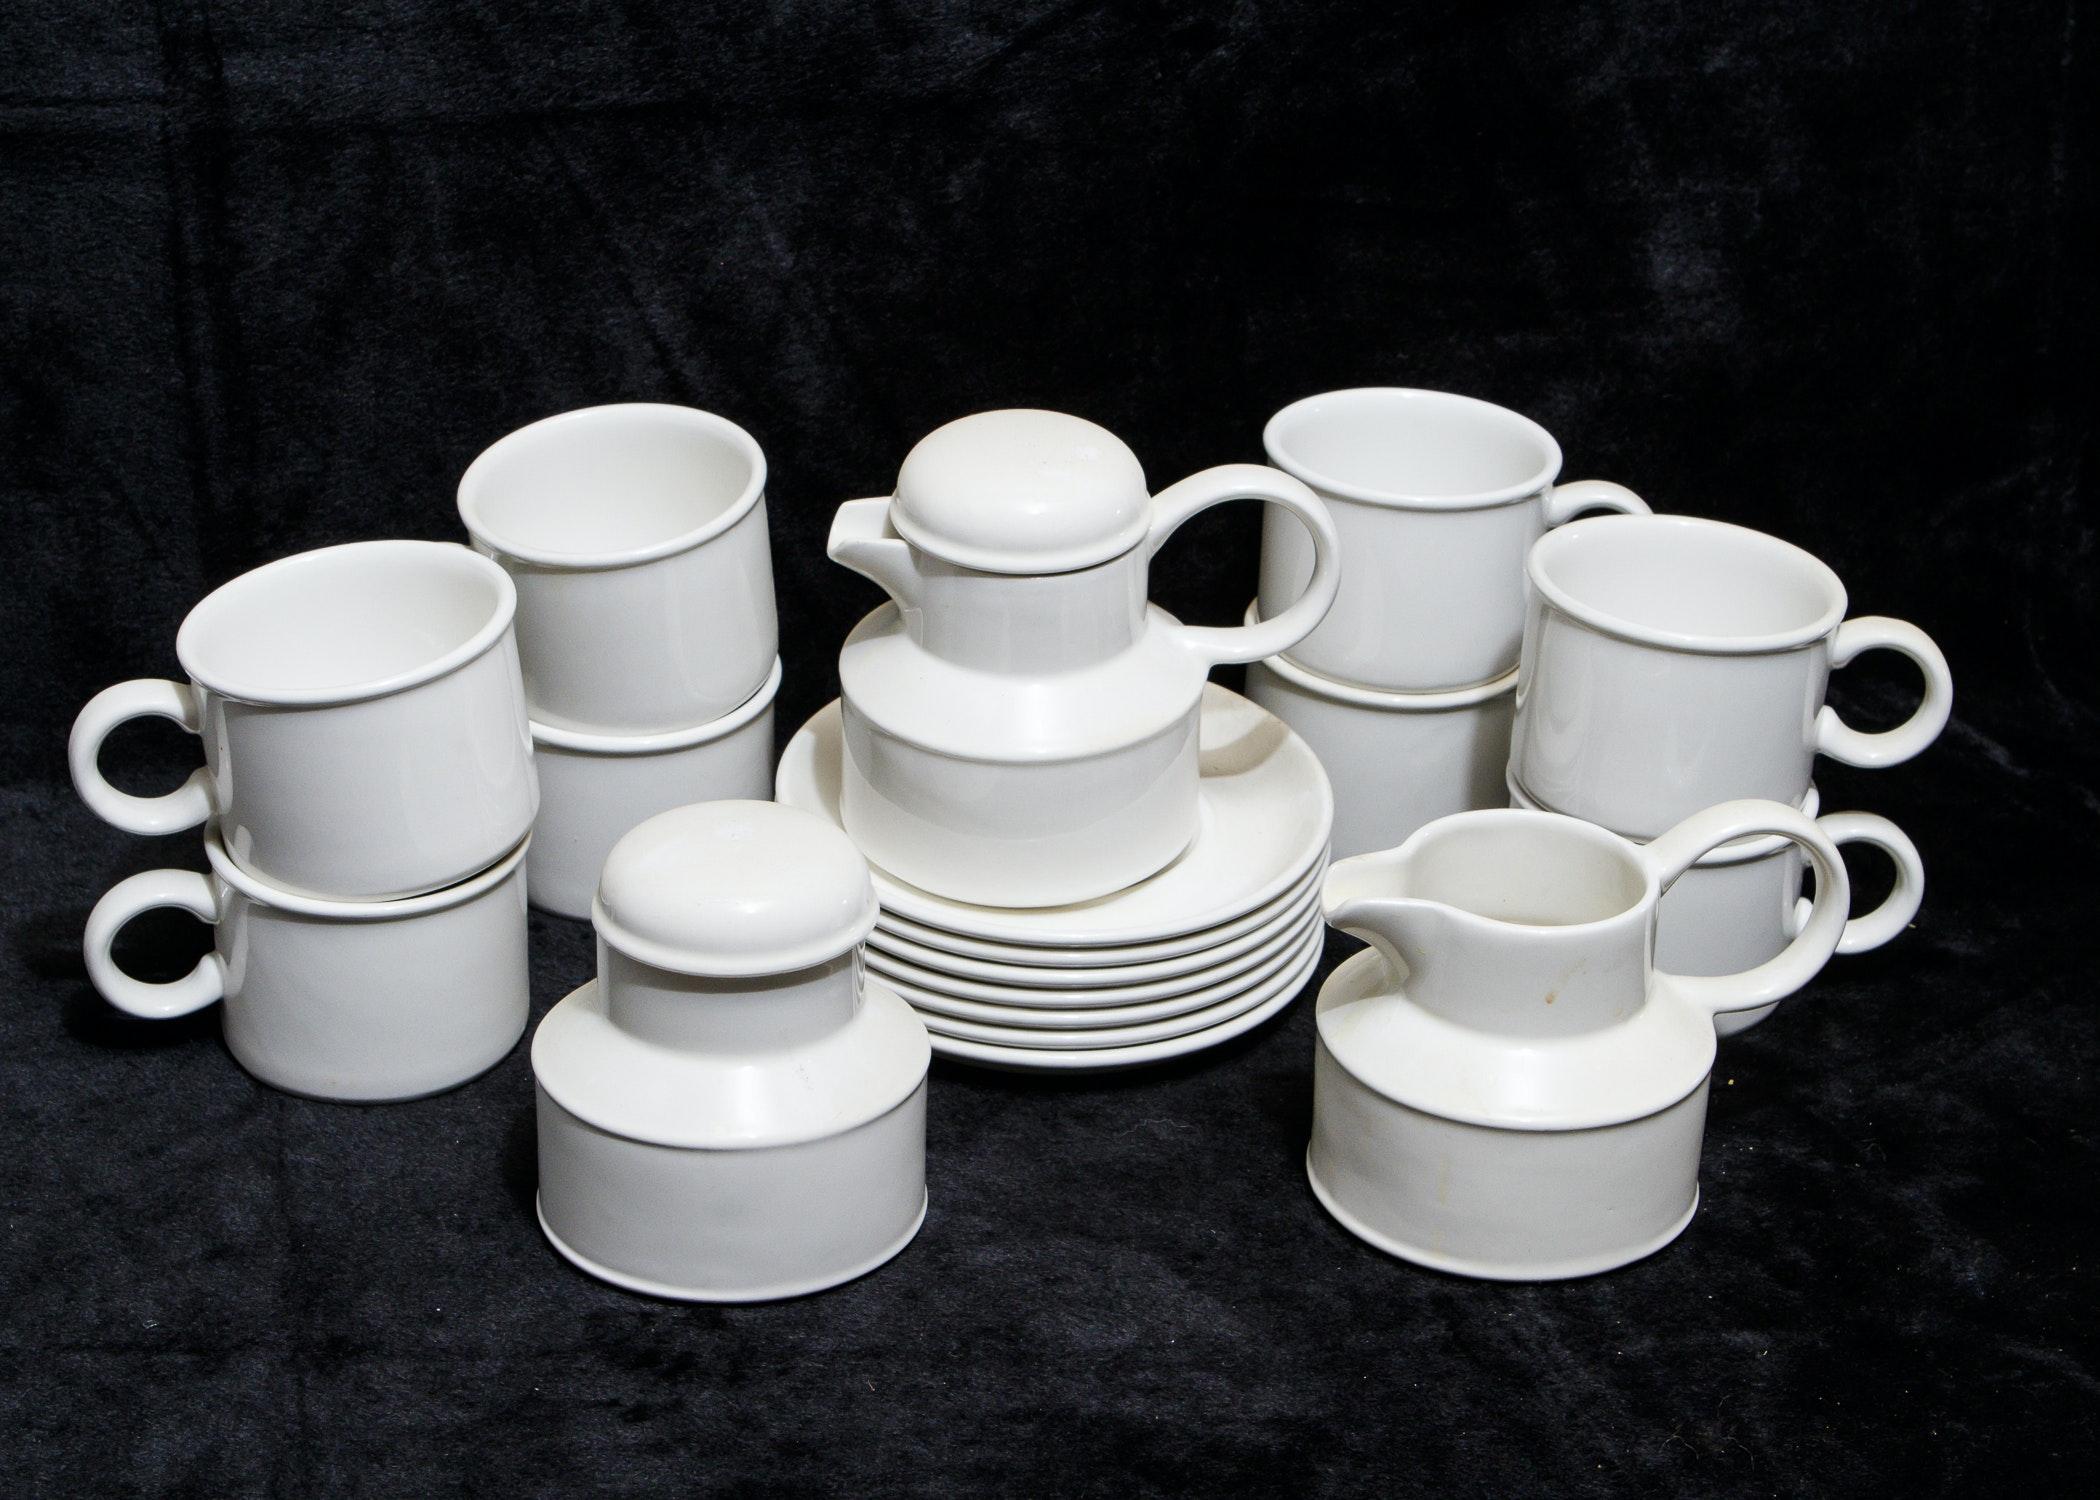 Midwinter \ Stonehenge\  Oven-To-Tableware ... & Midwinter \